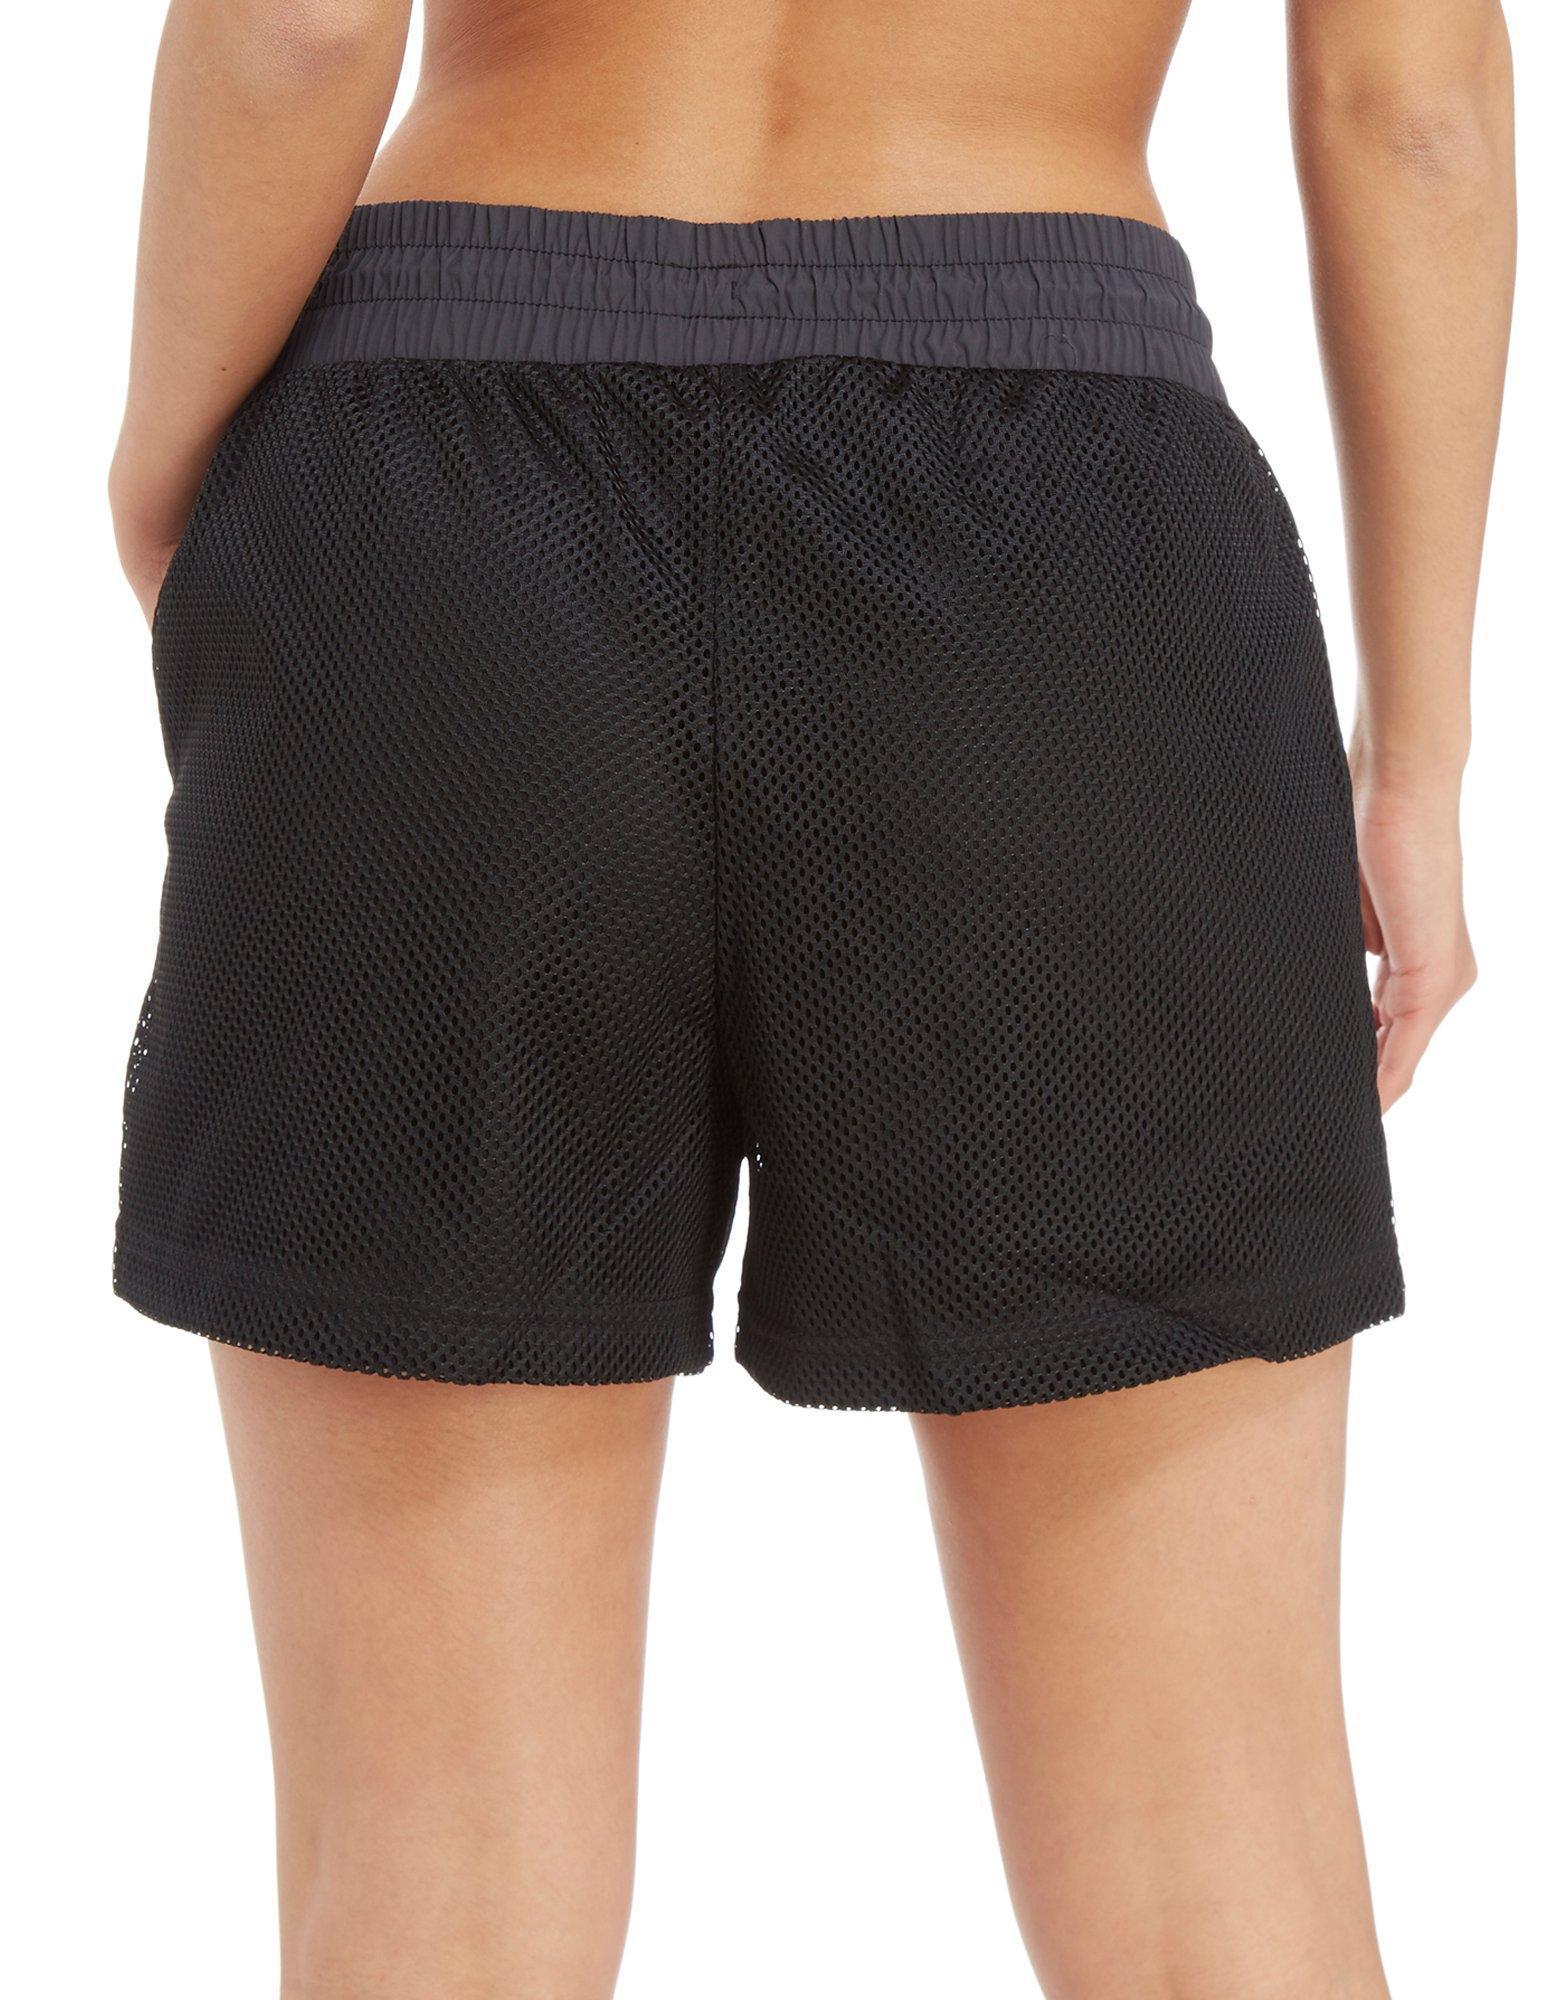 7c62b3c48ccfe Nike Swoosh Mesh Shorts in Black - Lyst